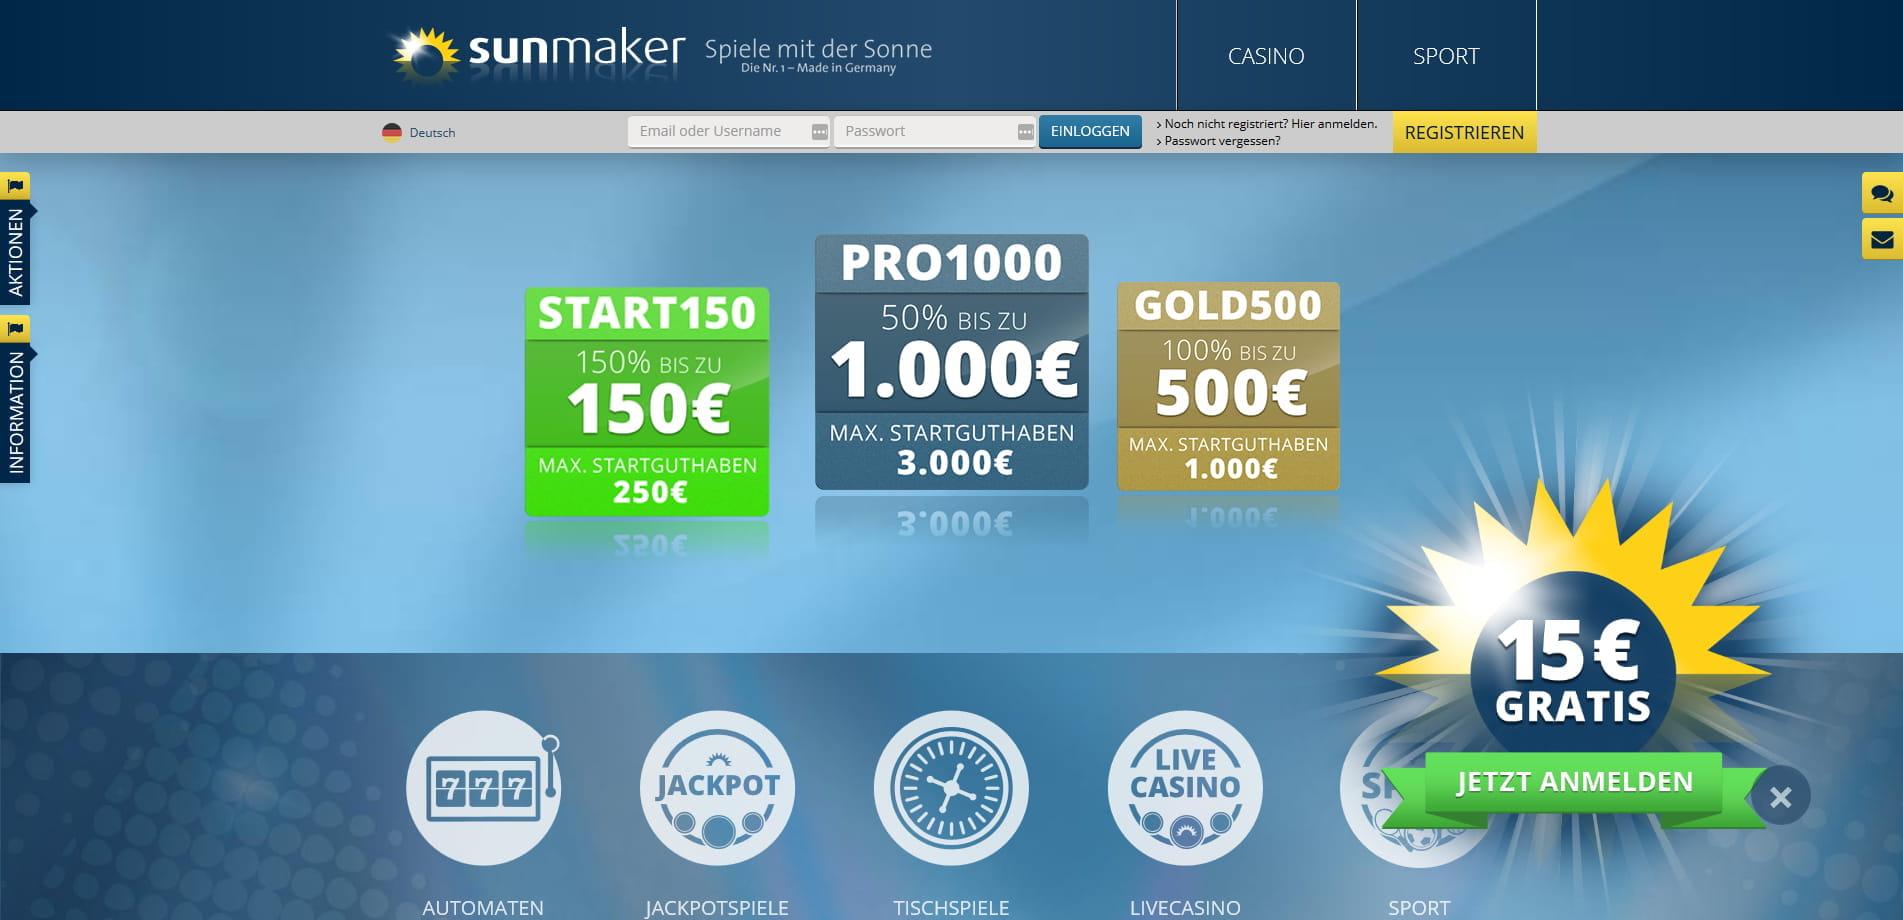 Casino 20 Euro Startguthaben